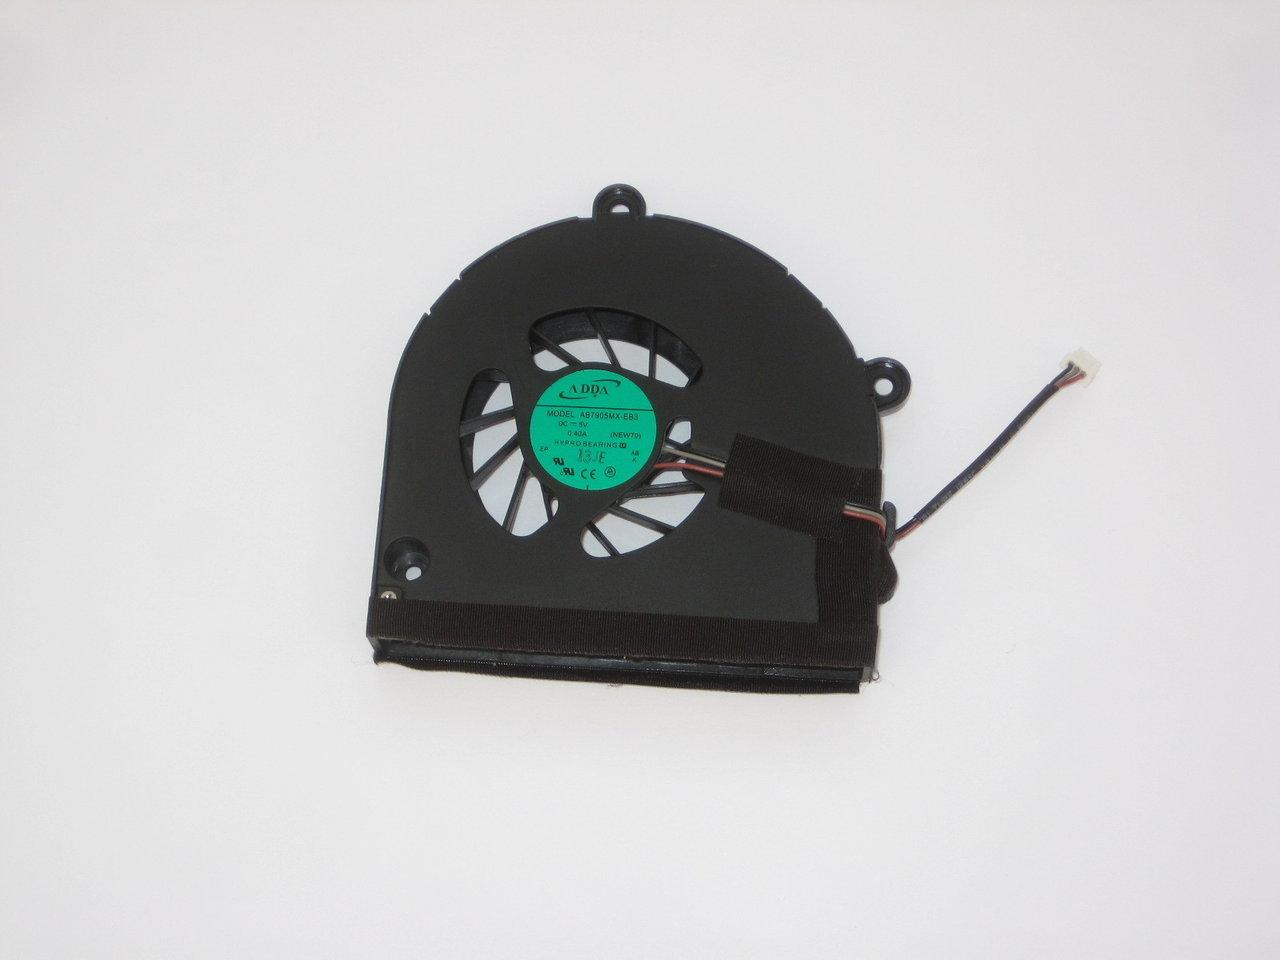 ADDA AB7905MX-EB3 Kühler Lüfter ACER / Packard Bell Notebook